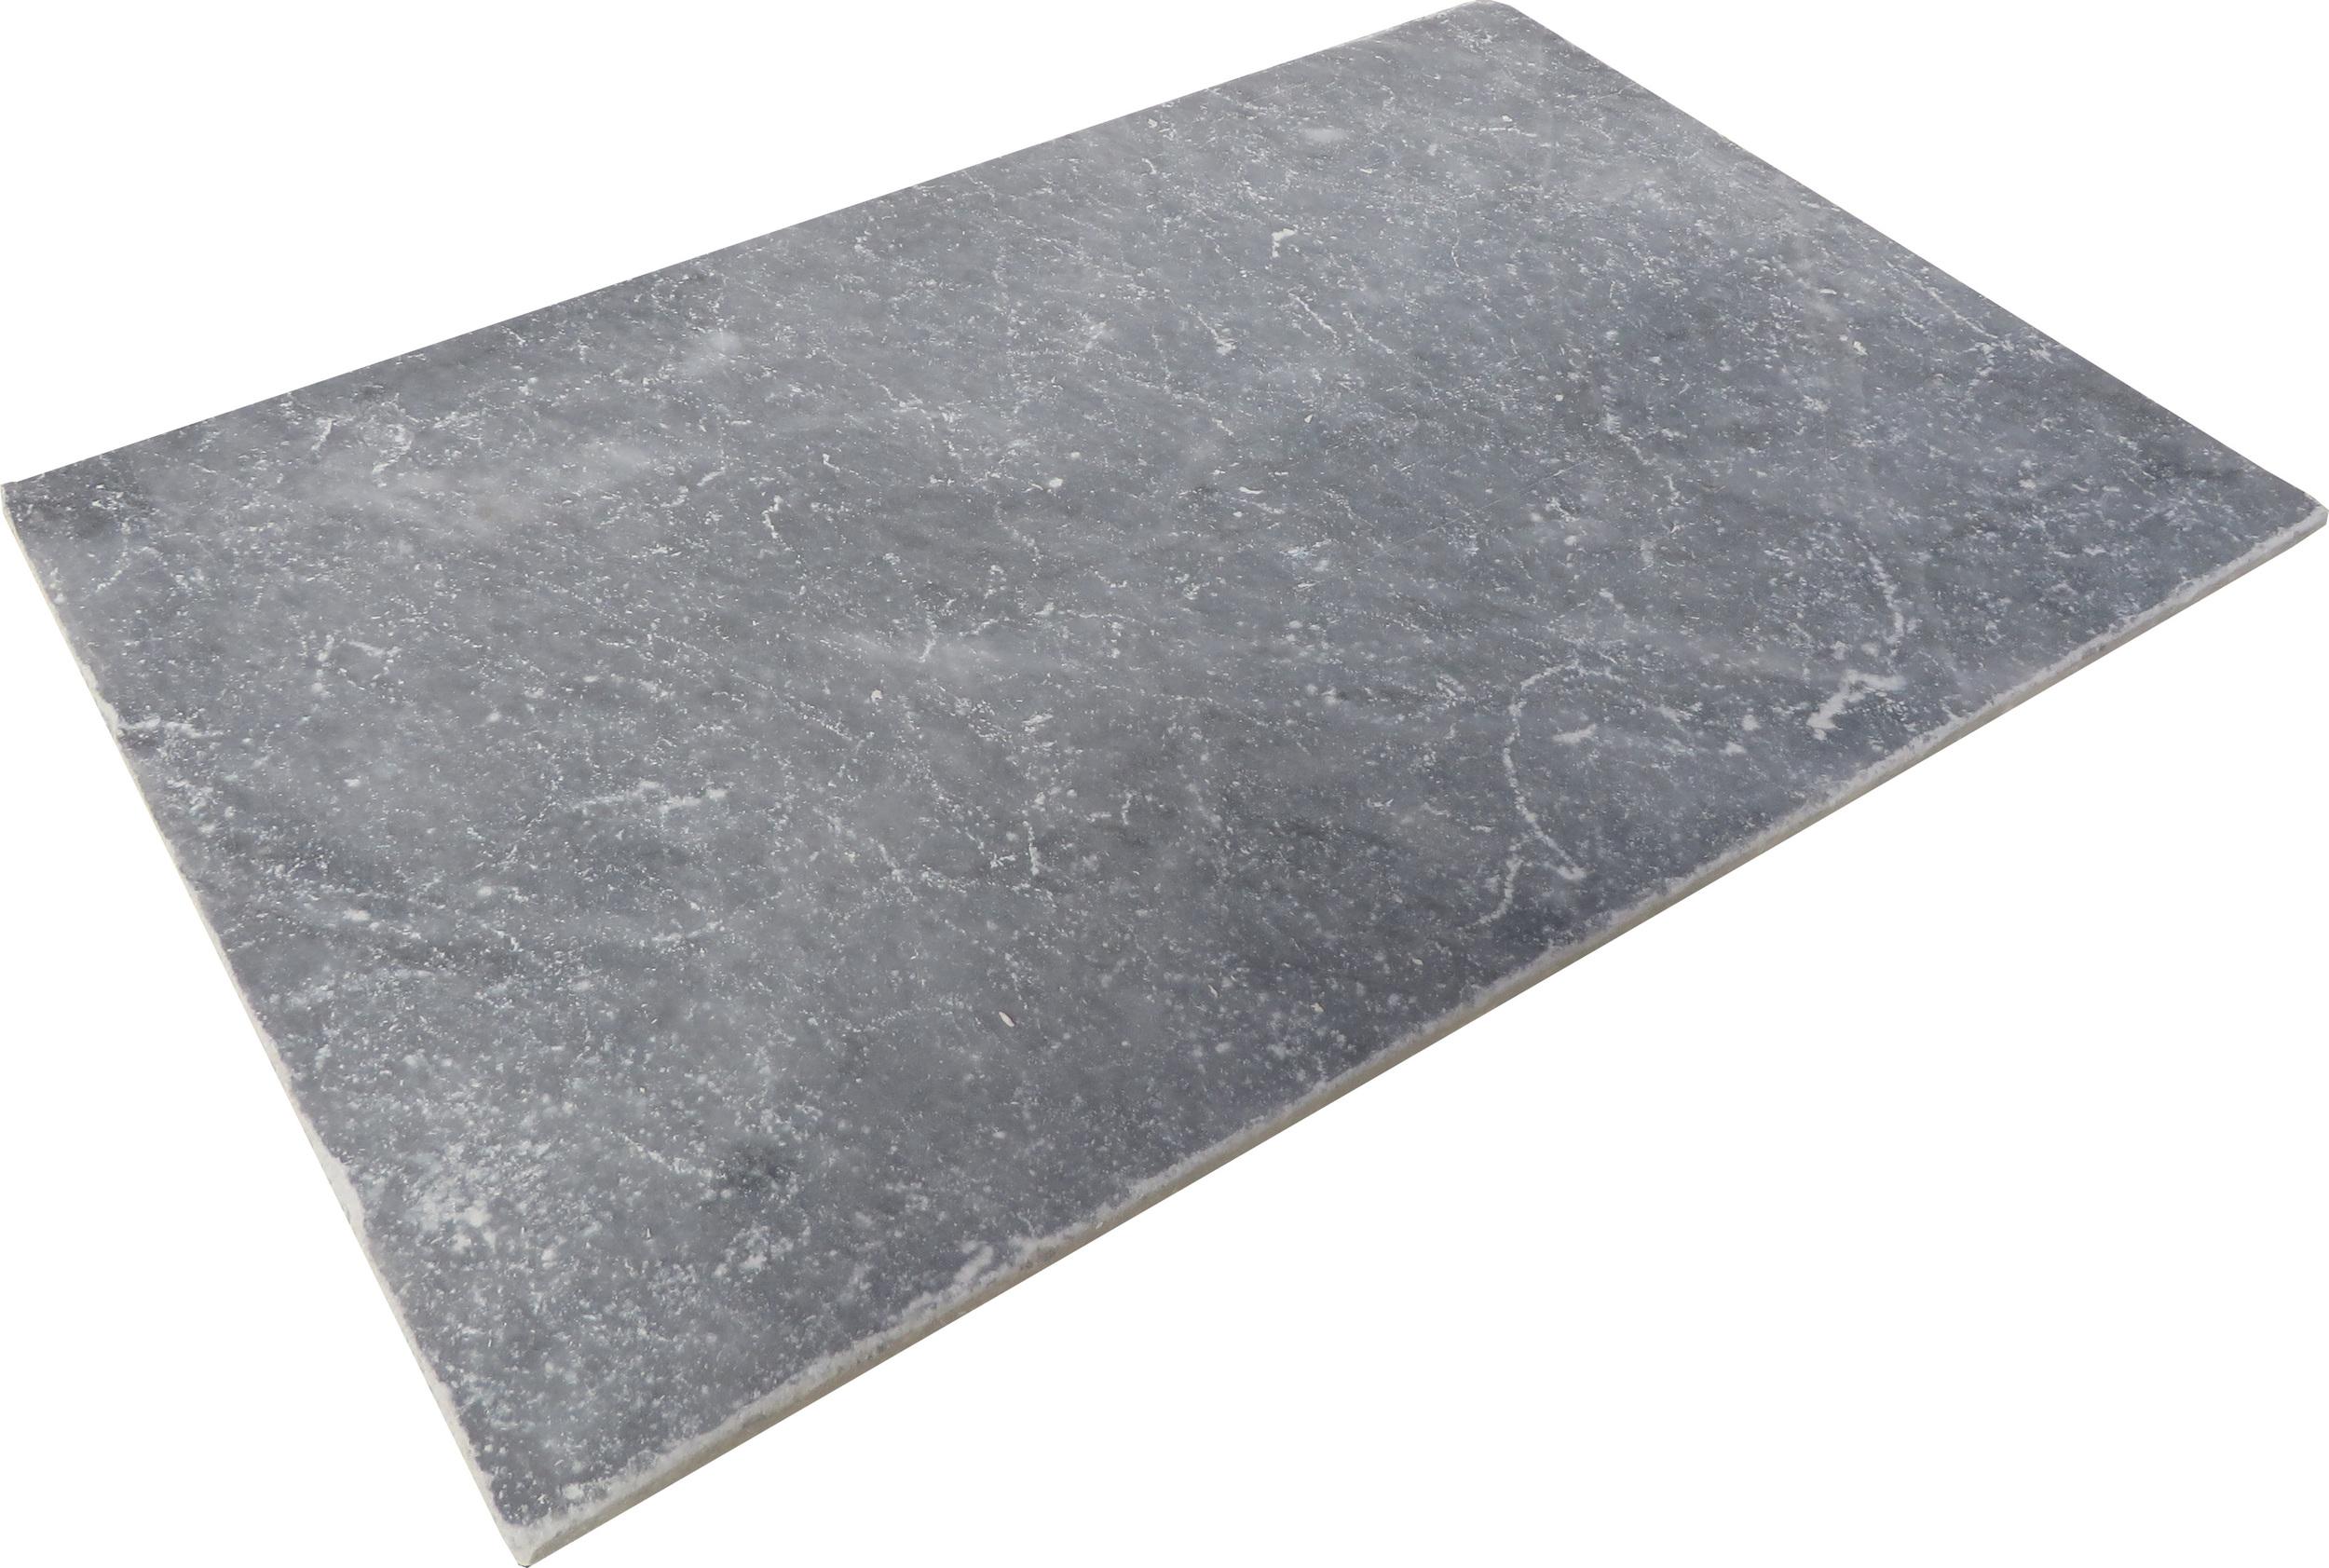 Nero tiles tumbled - 300x300x10mm